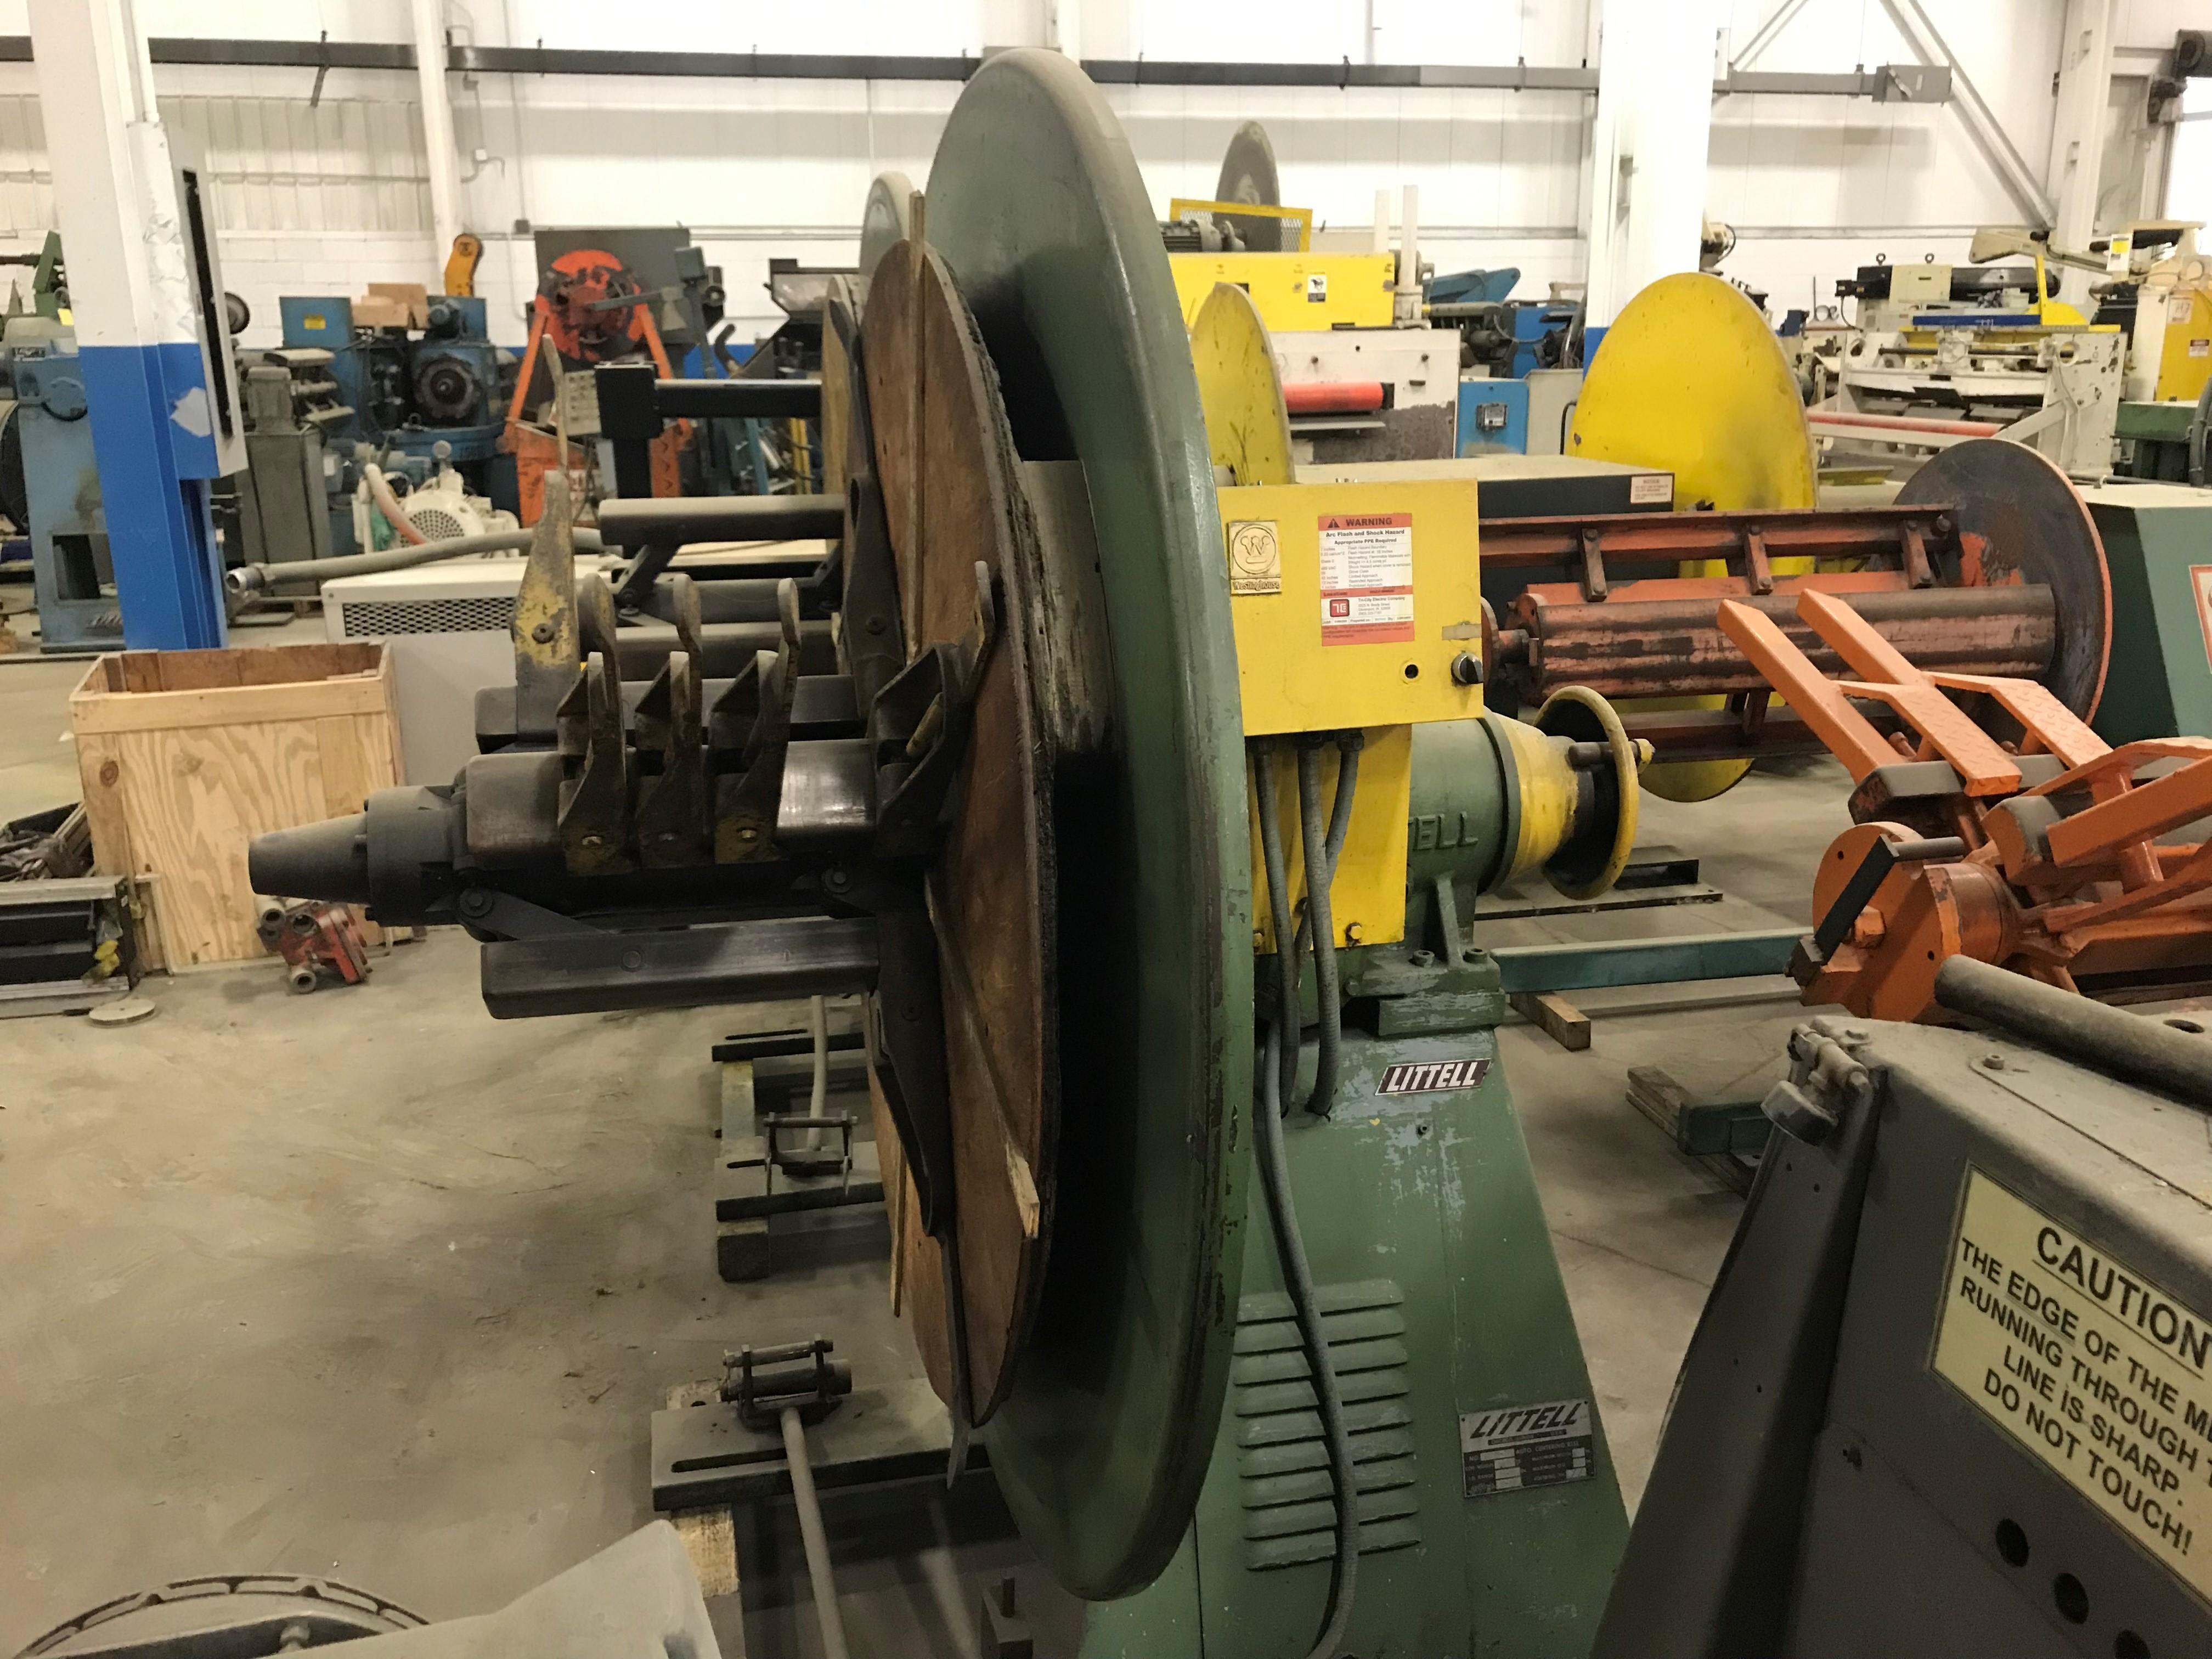 Littell Motorized Coil Reel Uncoiler 4,000 Lbs. x 18